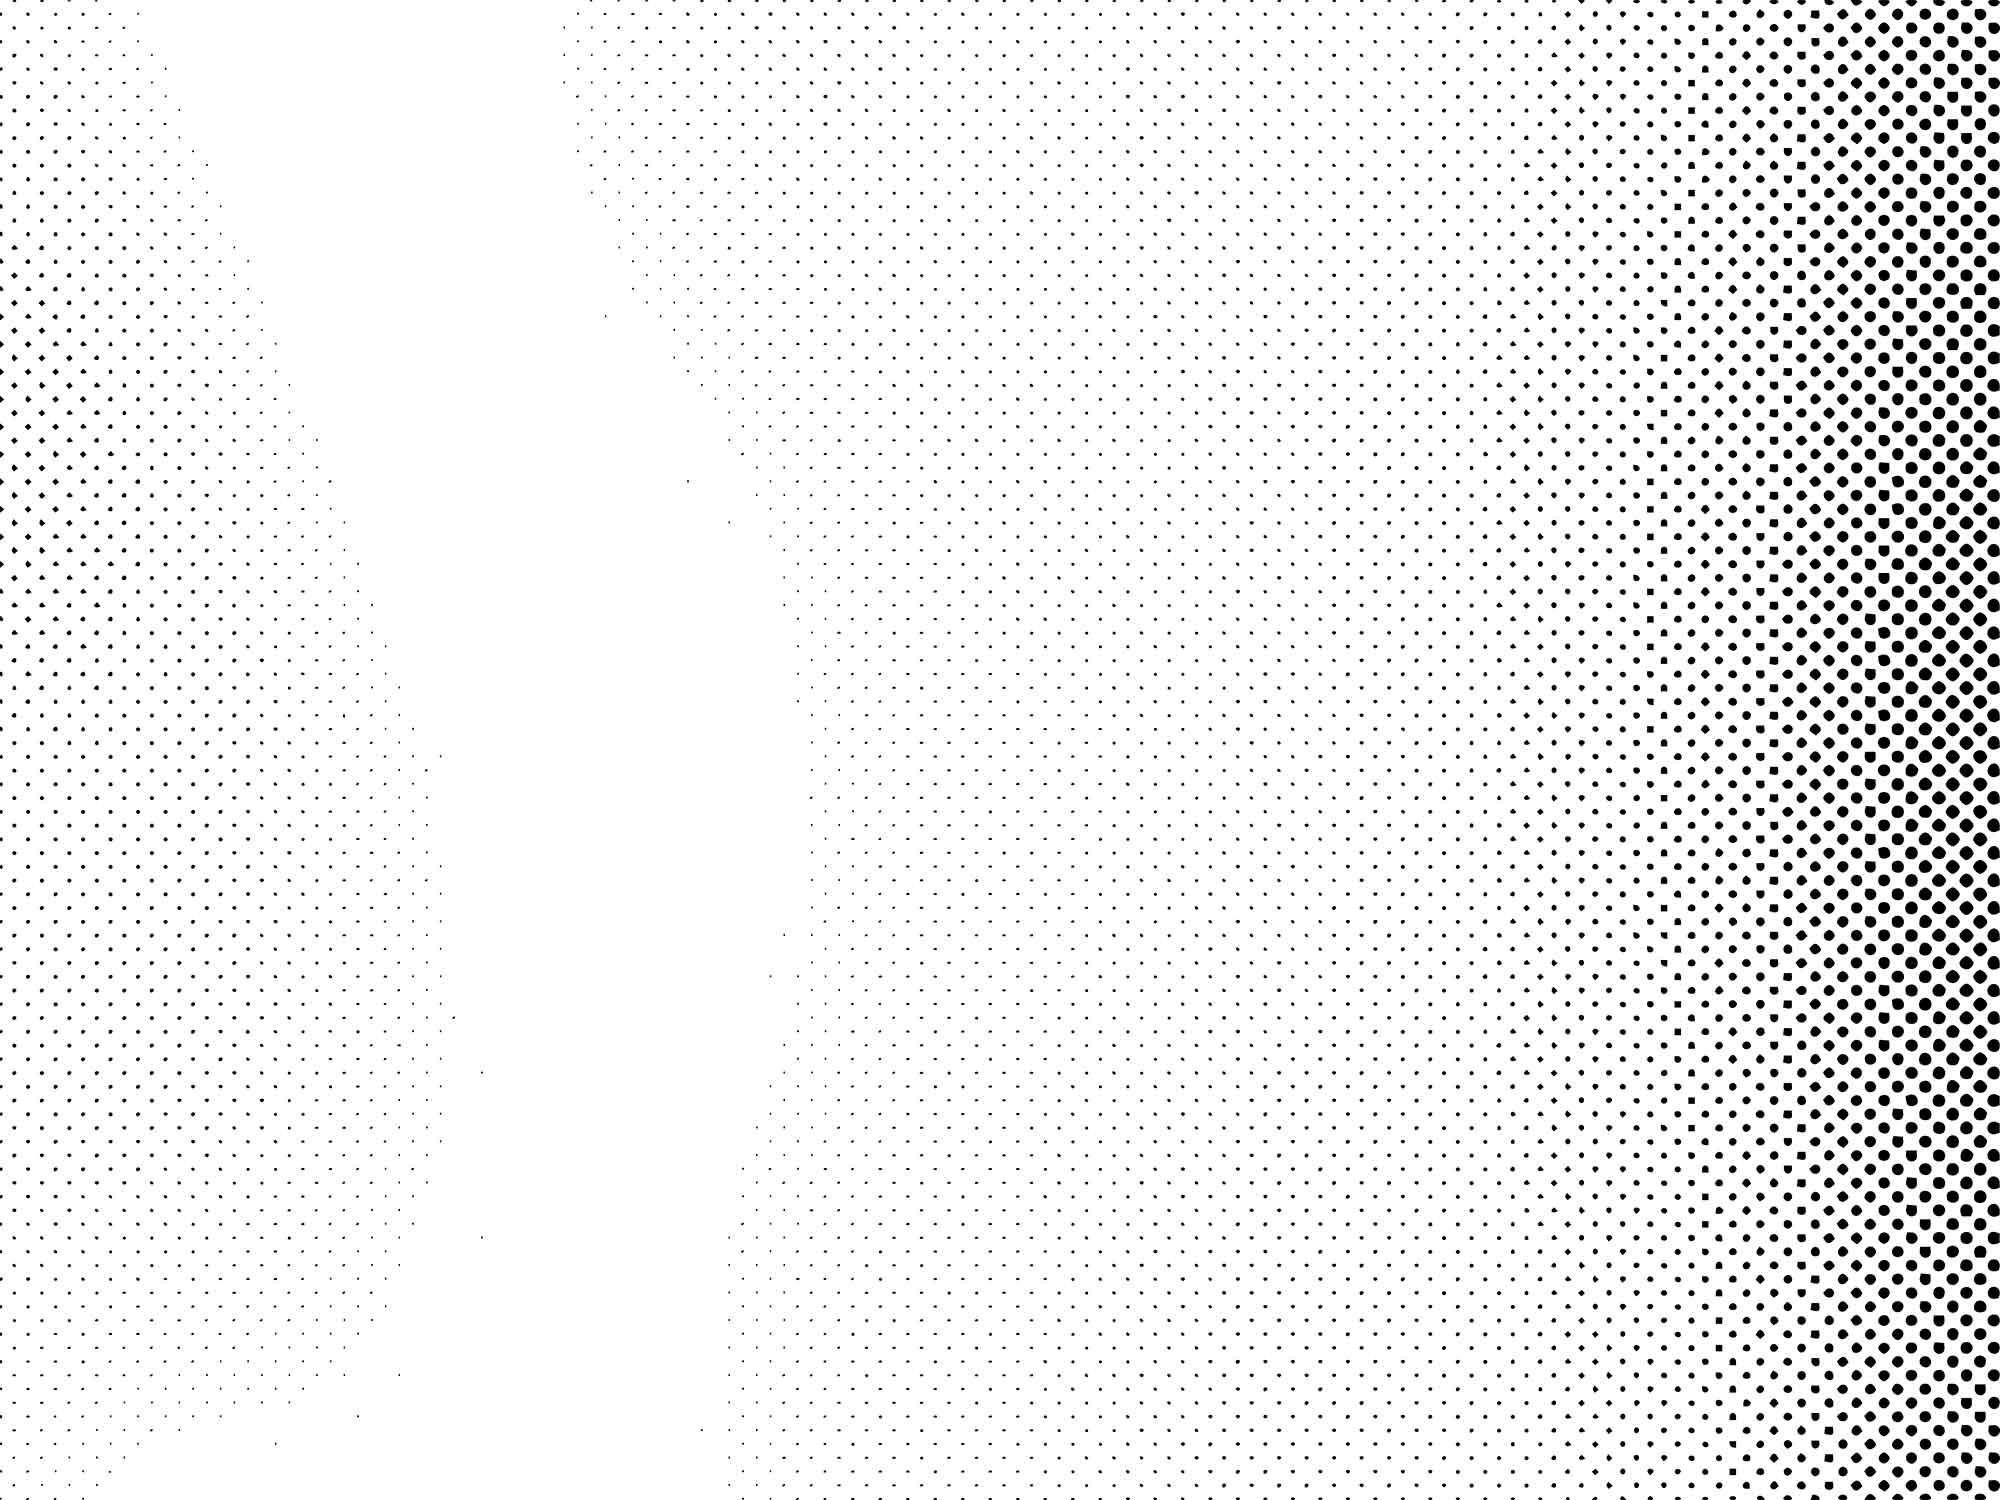 Halftone Dot Textures 4